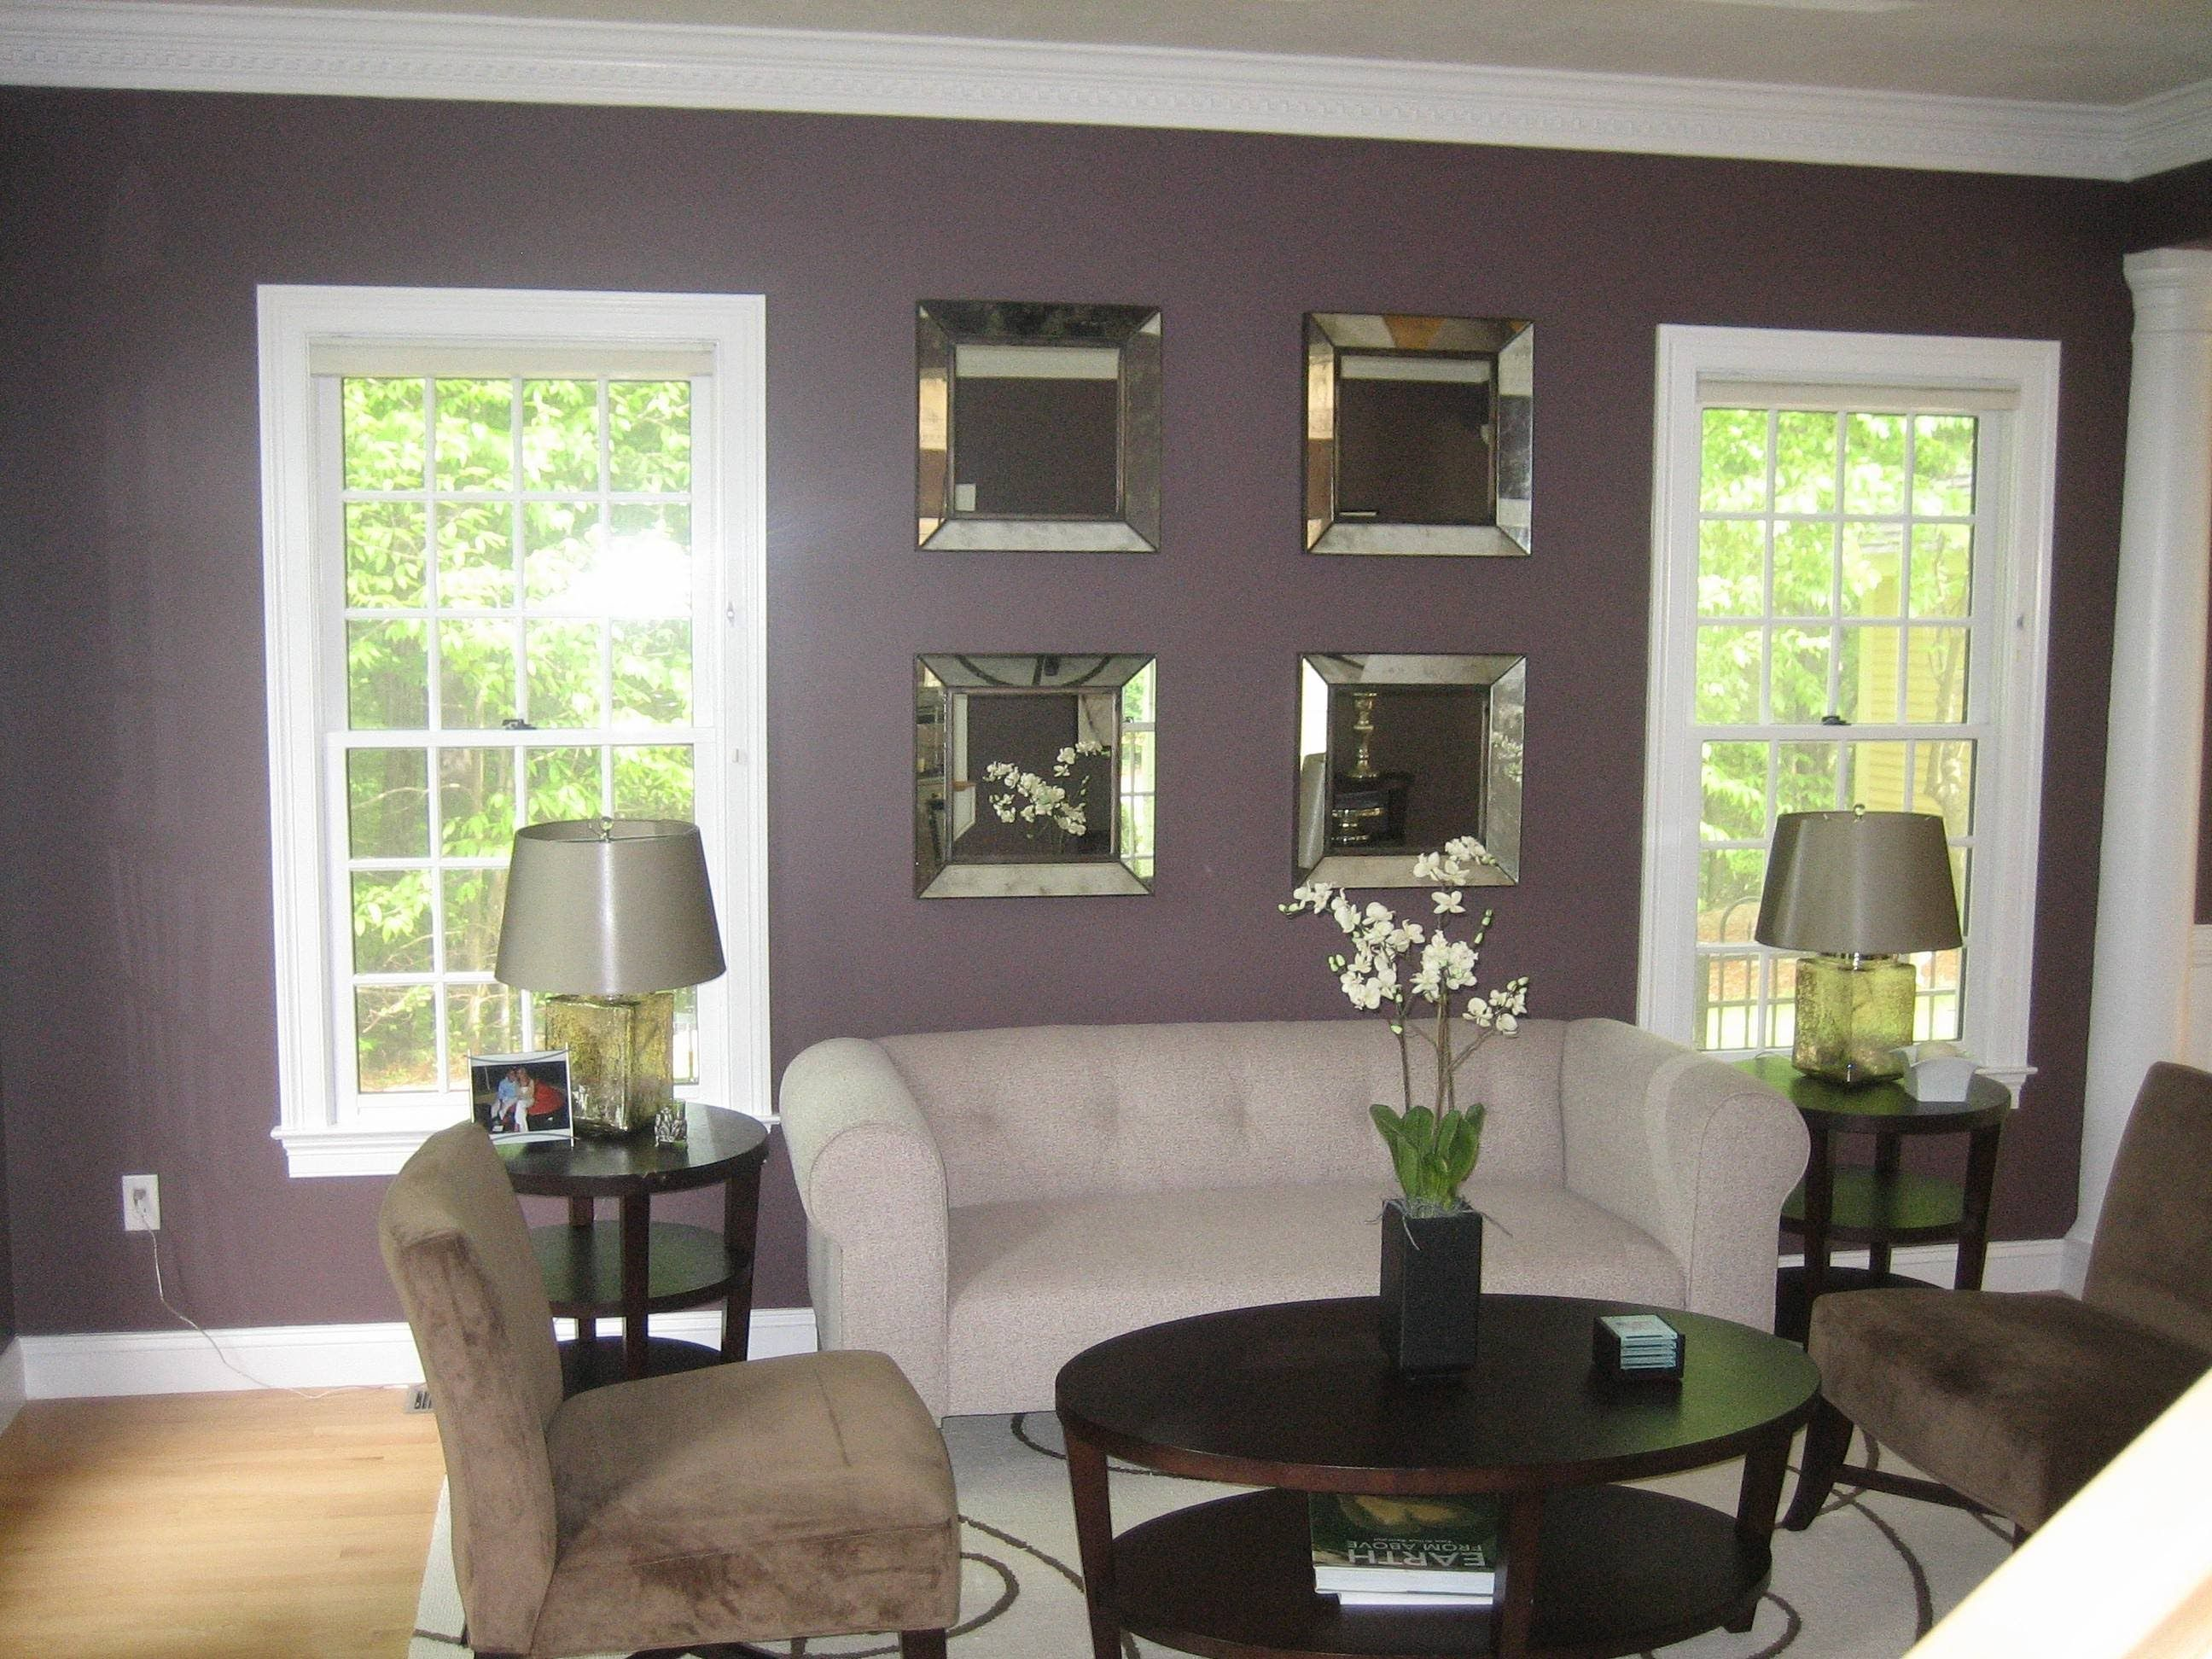 Best Room Paint Amazon Soil Google Search Beautiful 640 x 480